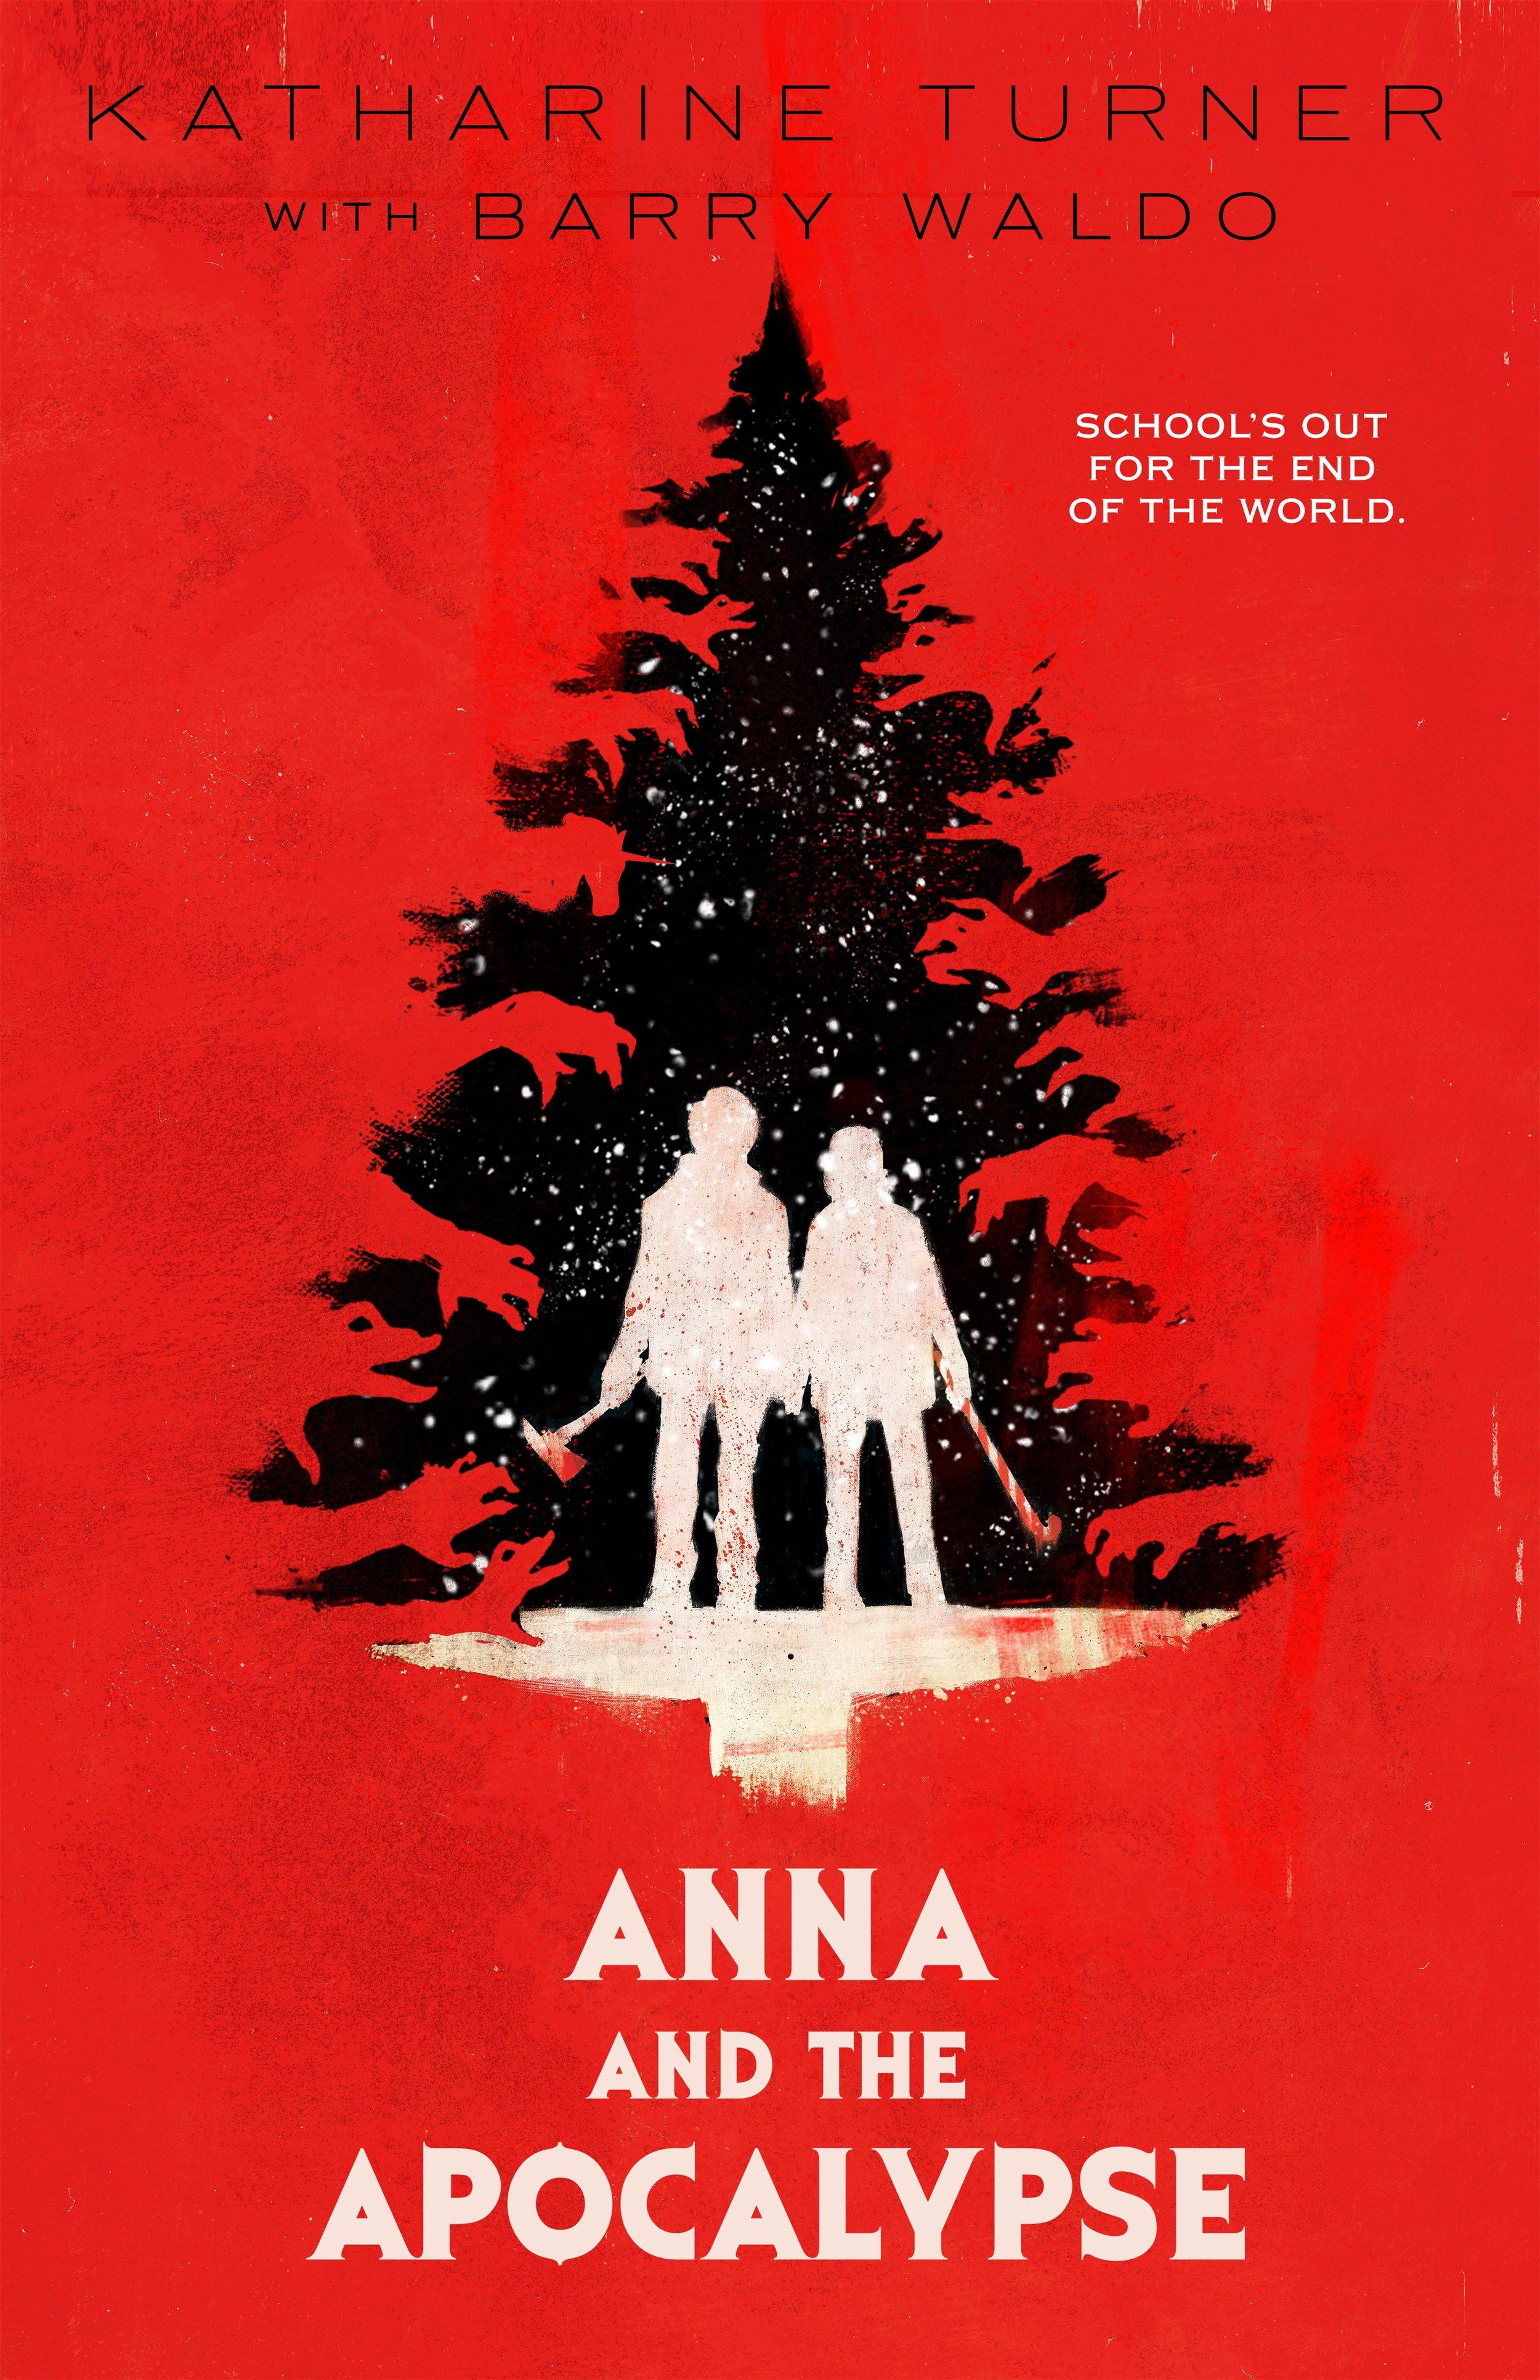 Anna and the Apocalypse cover.jpg